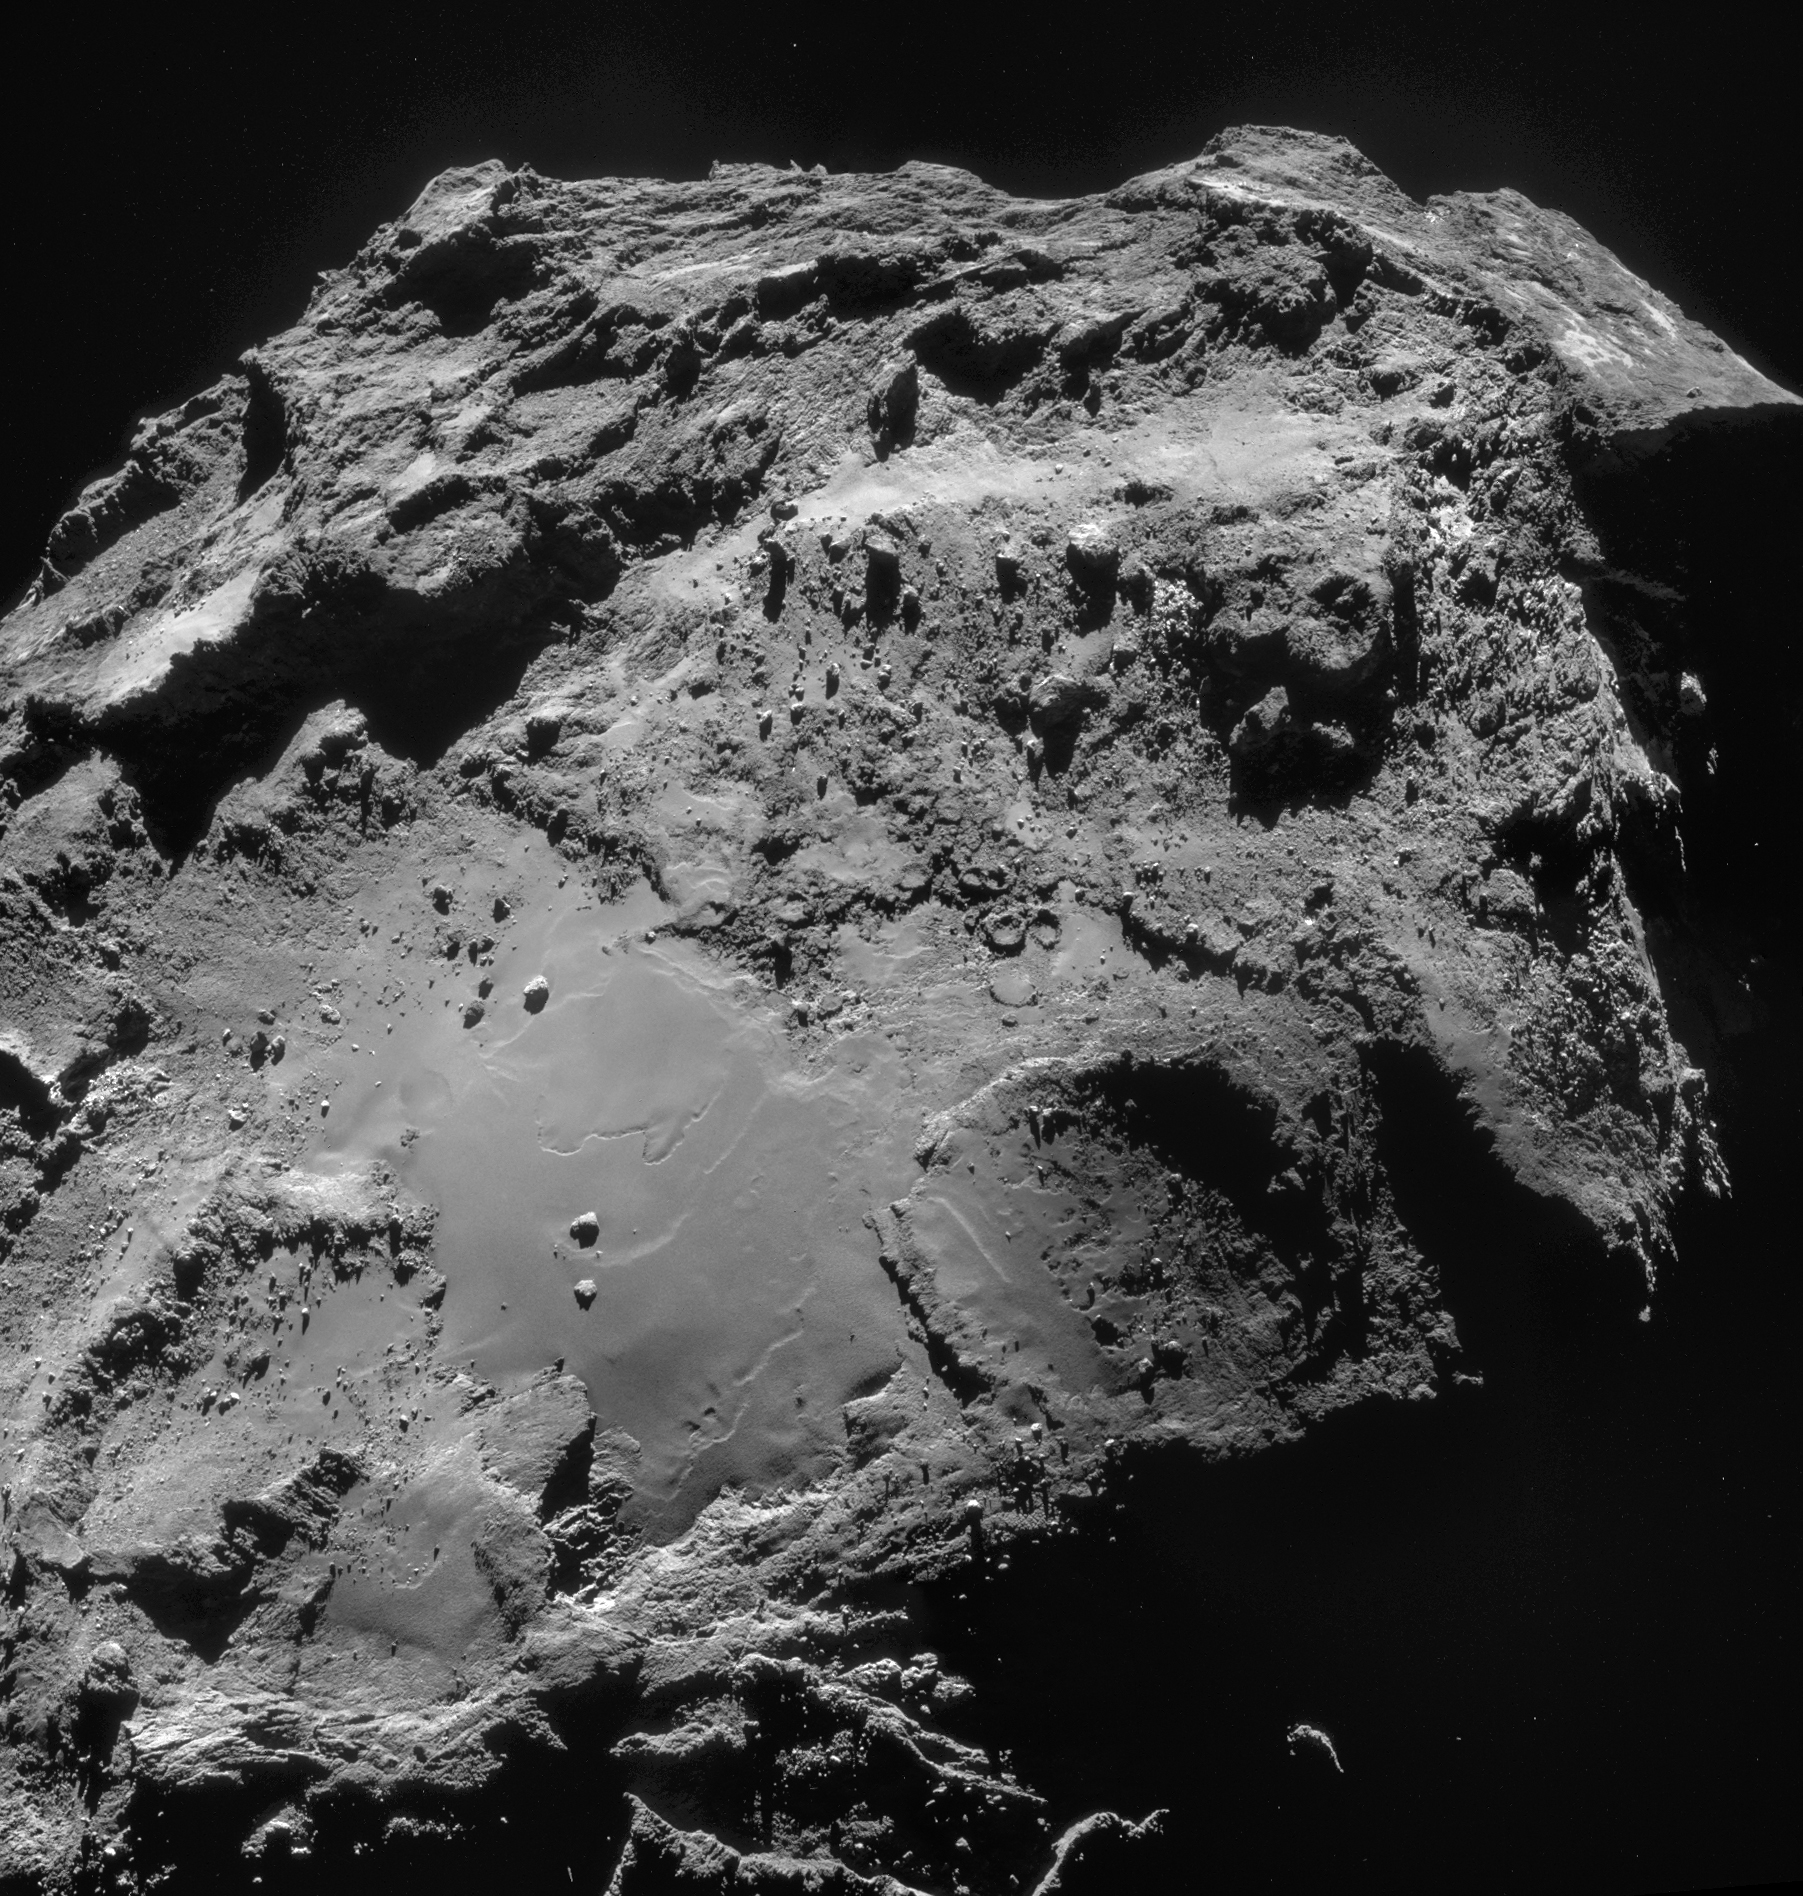 Daring Philae Comet Landing Named Top Breakthrough of 2014